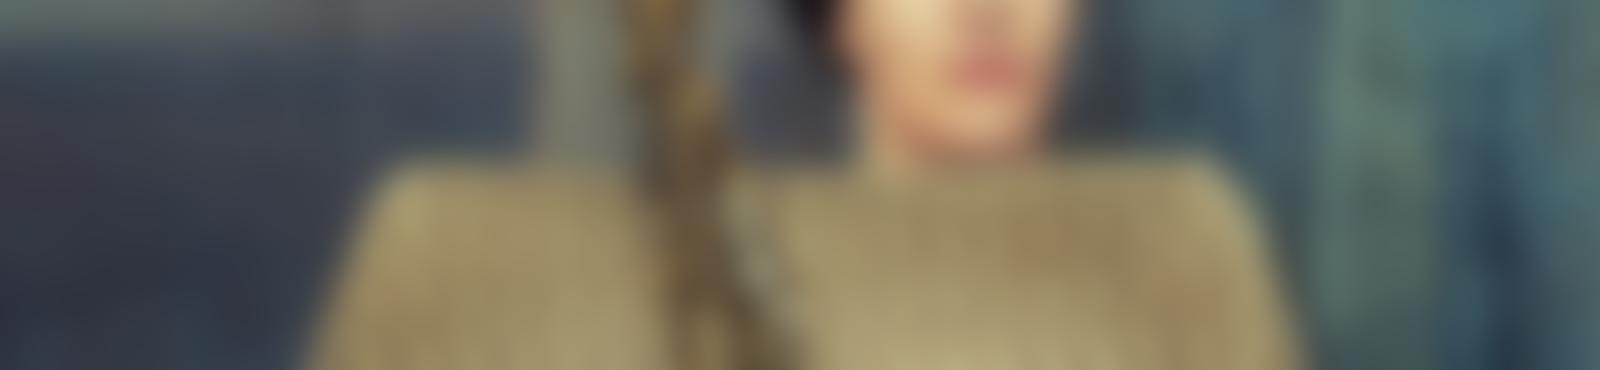 Blurred adfd092f 50bf 497b 8902 ea3a6d5ab3a7